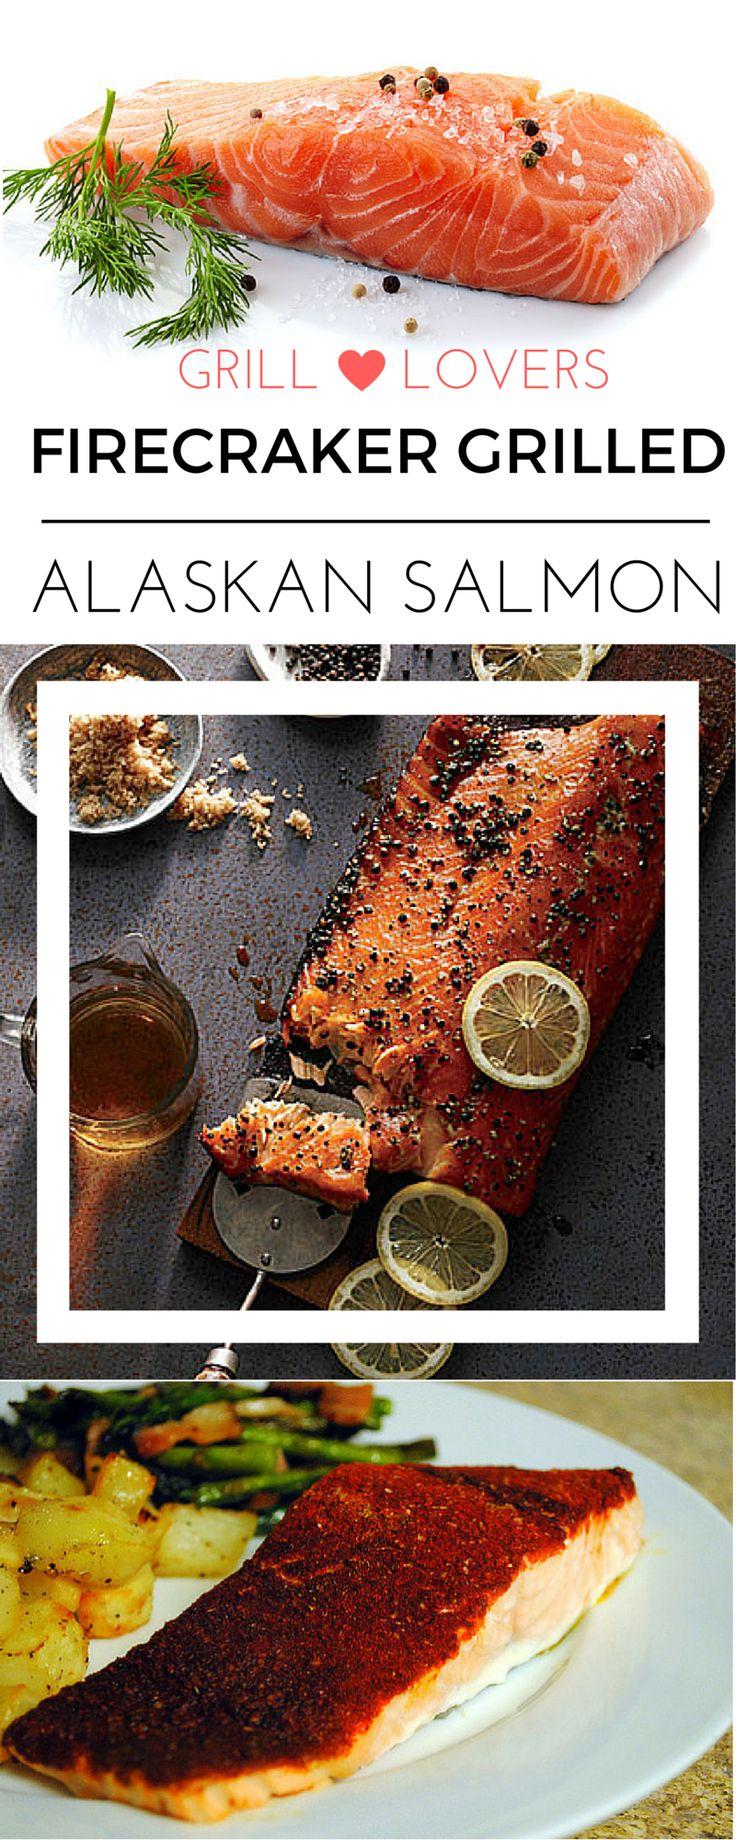 PrintGrill Lovers' Firecracker Grilled Alaskan Salmon Recipe ...